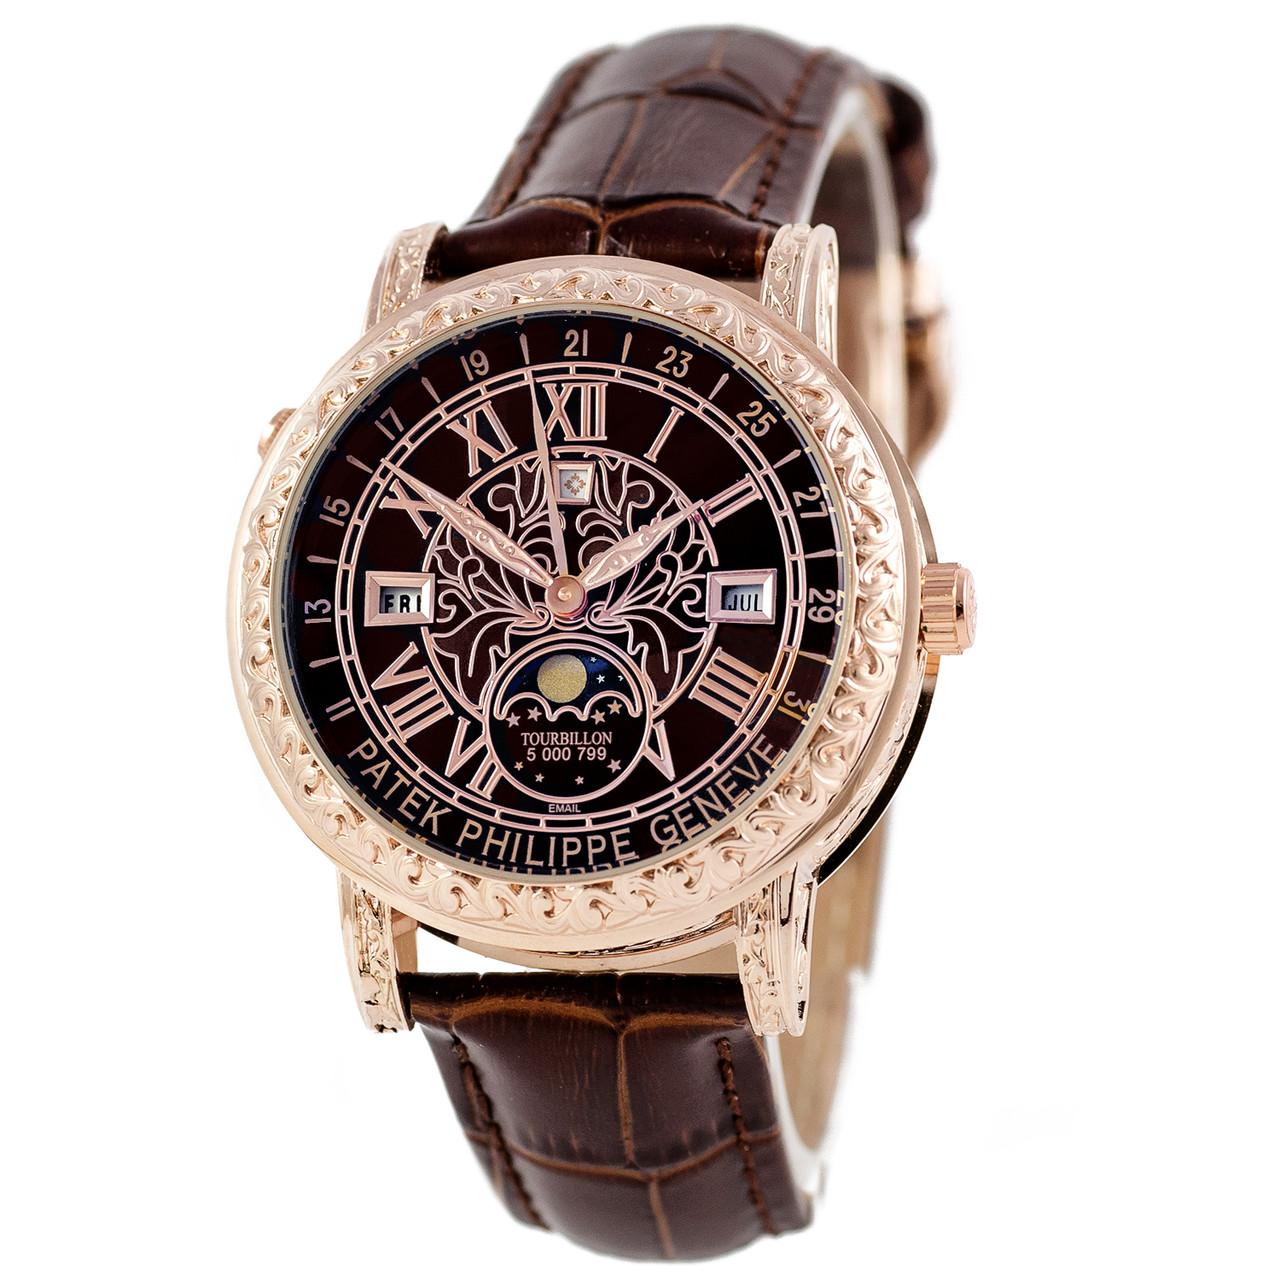 b74a6701 Астрономические часы Patek Philippe Grand Complications 6002 Sky Moon  Tourbillon - цвет золото с коричневым